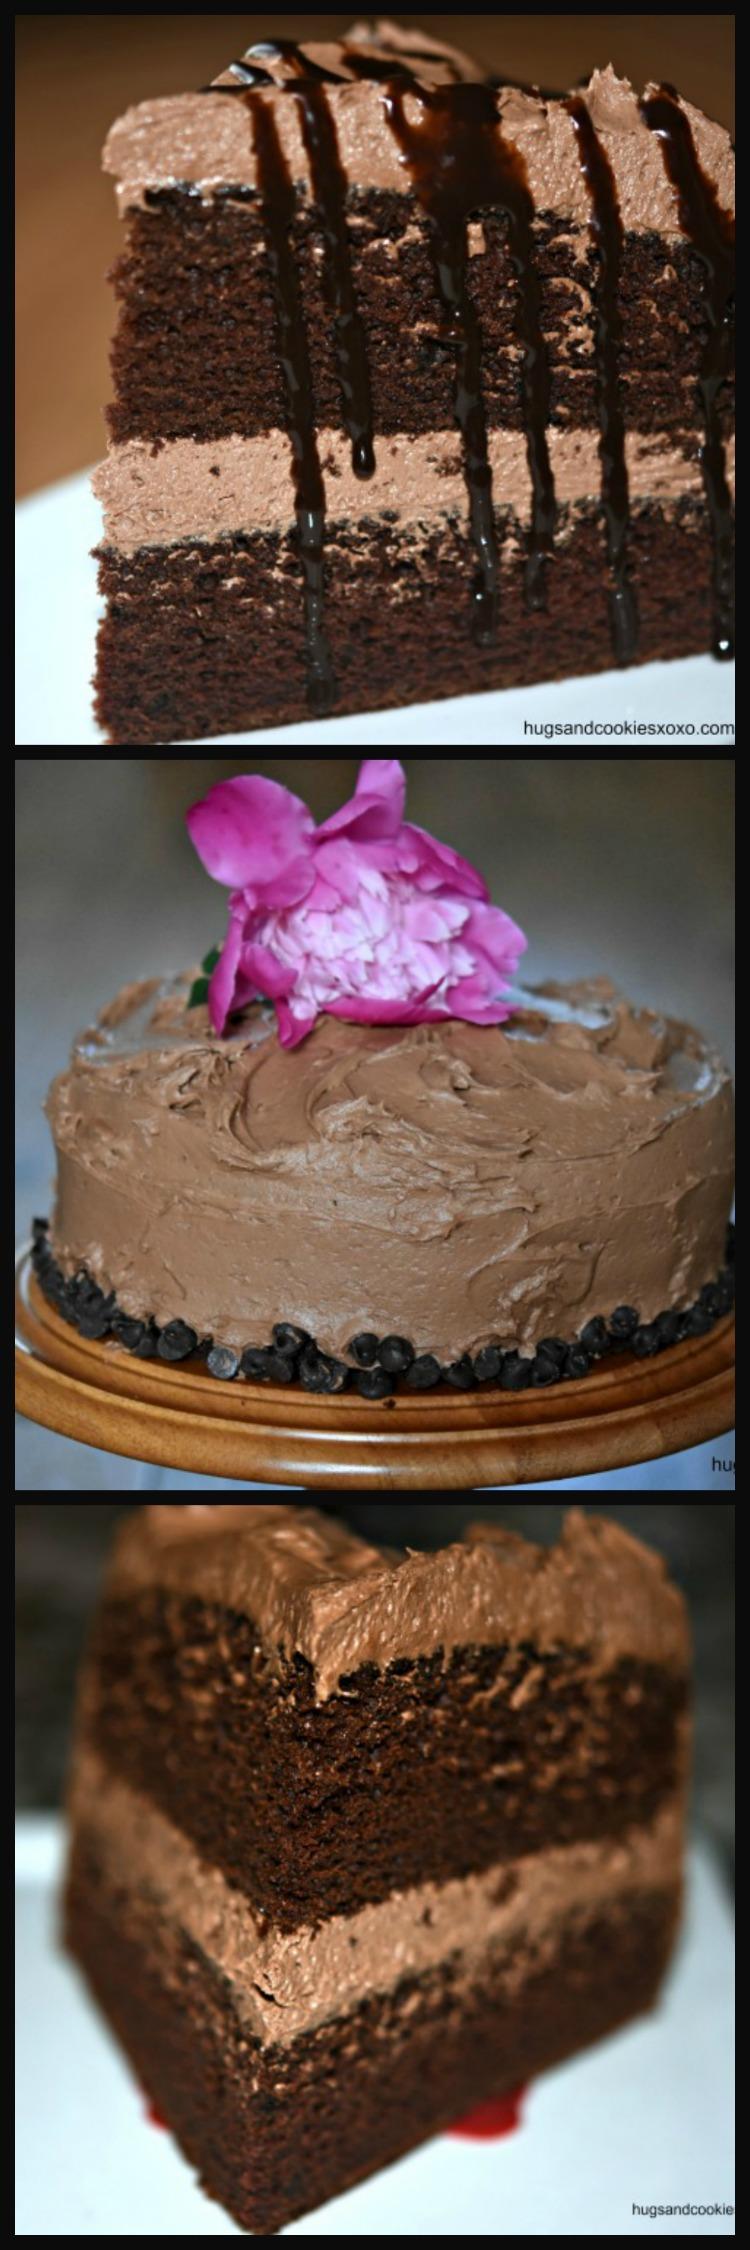 Chocolate Mayonnaise Cake - Hugs and Cookies XOXO